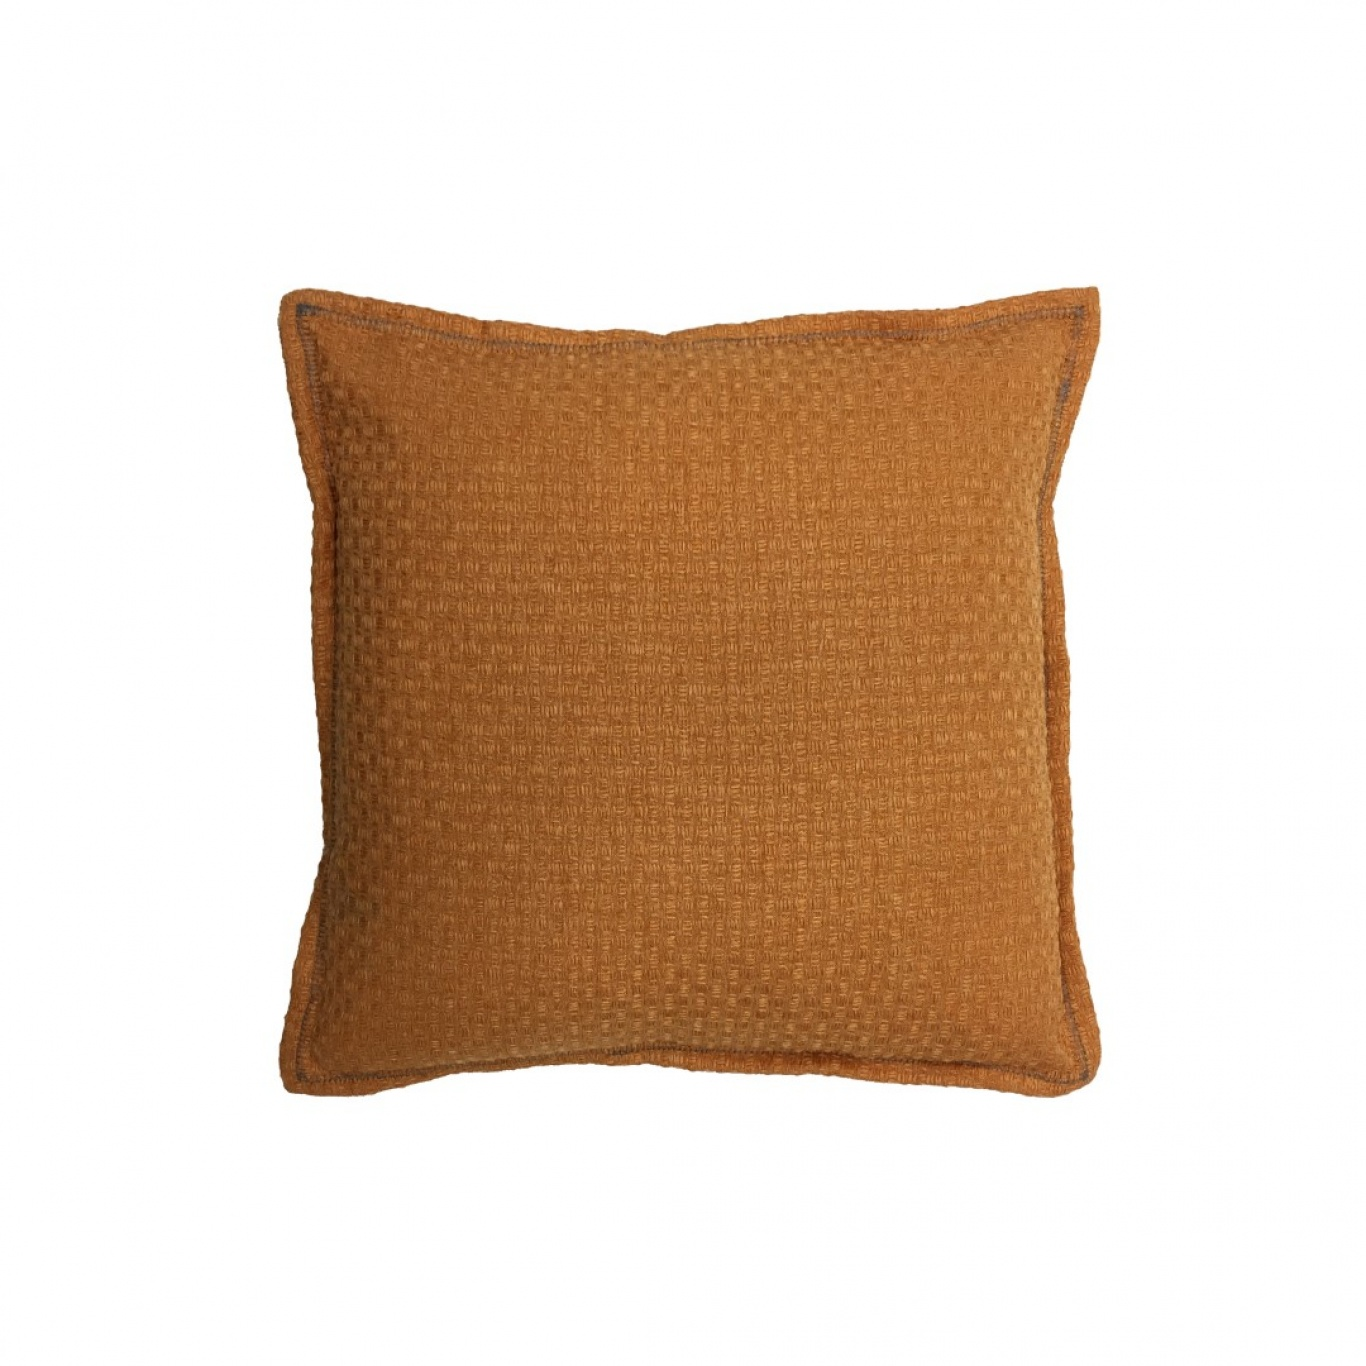 Image of Voyage Nessa Manderin Cushion